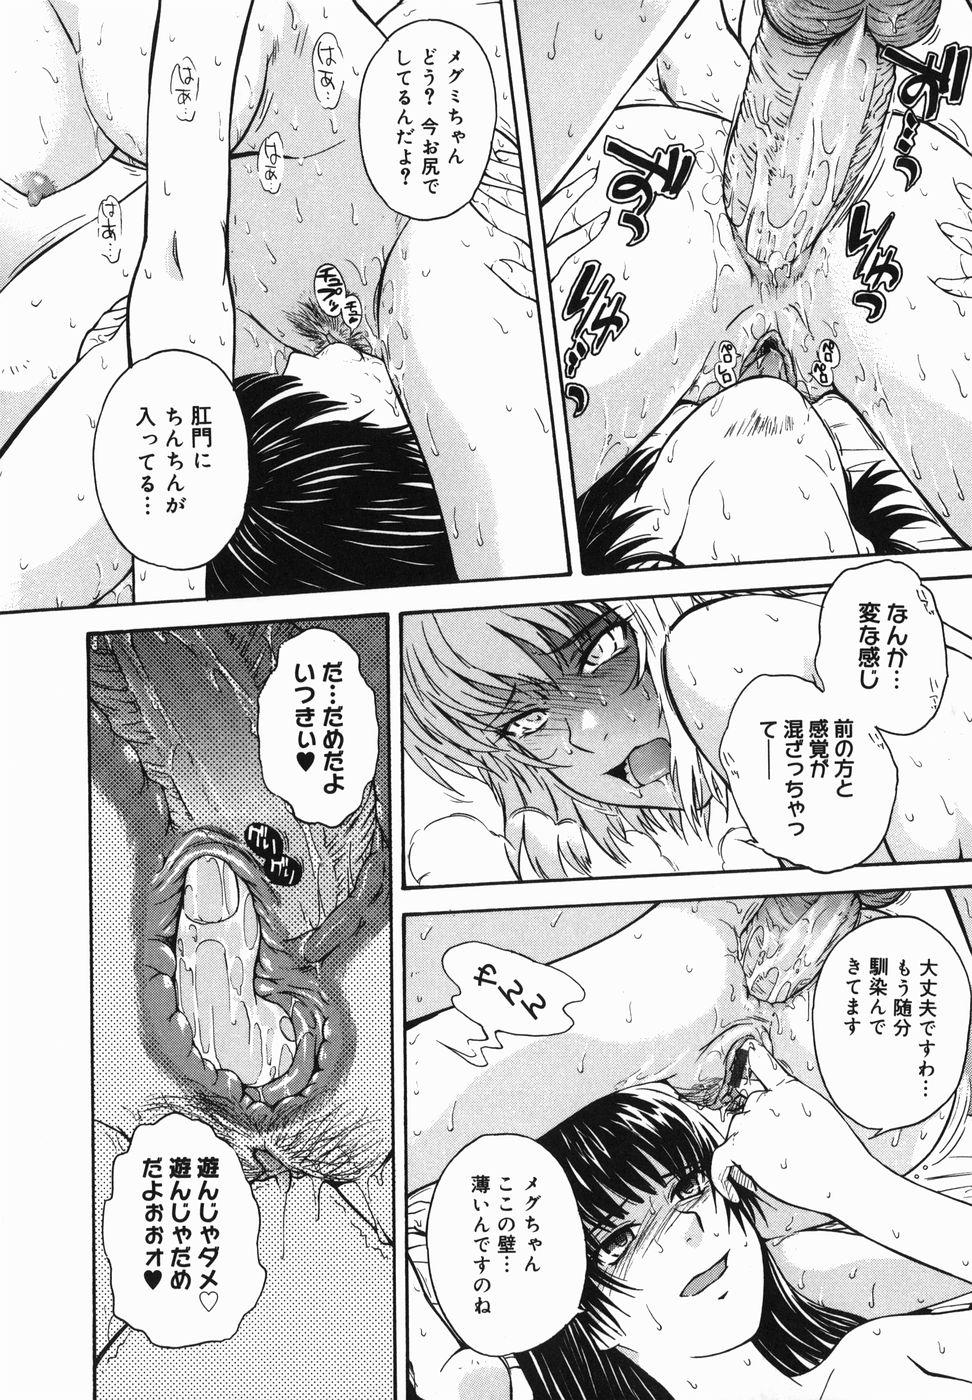 ♭38℃ Loveberry Twins 205